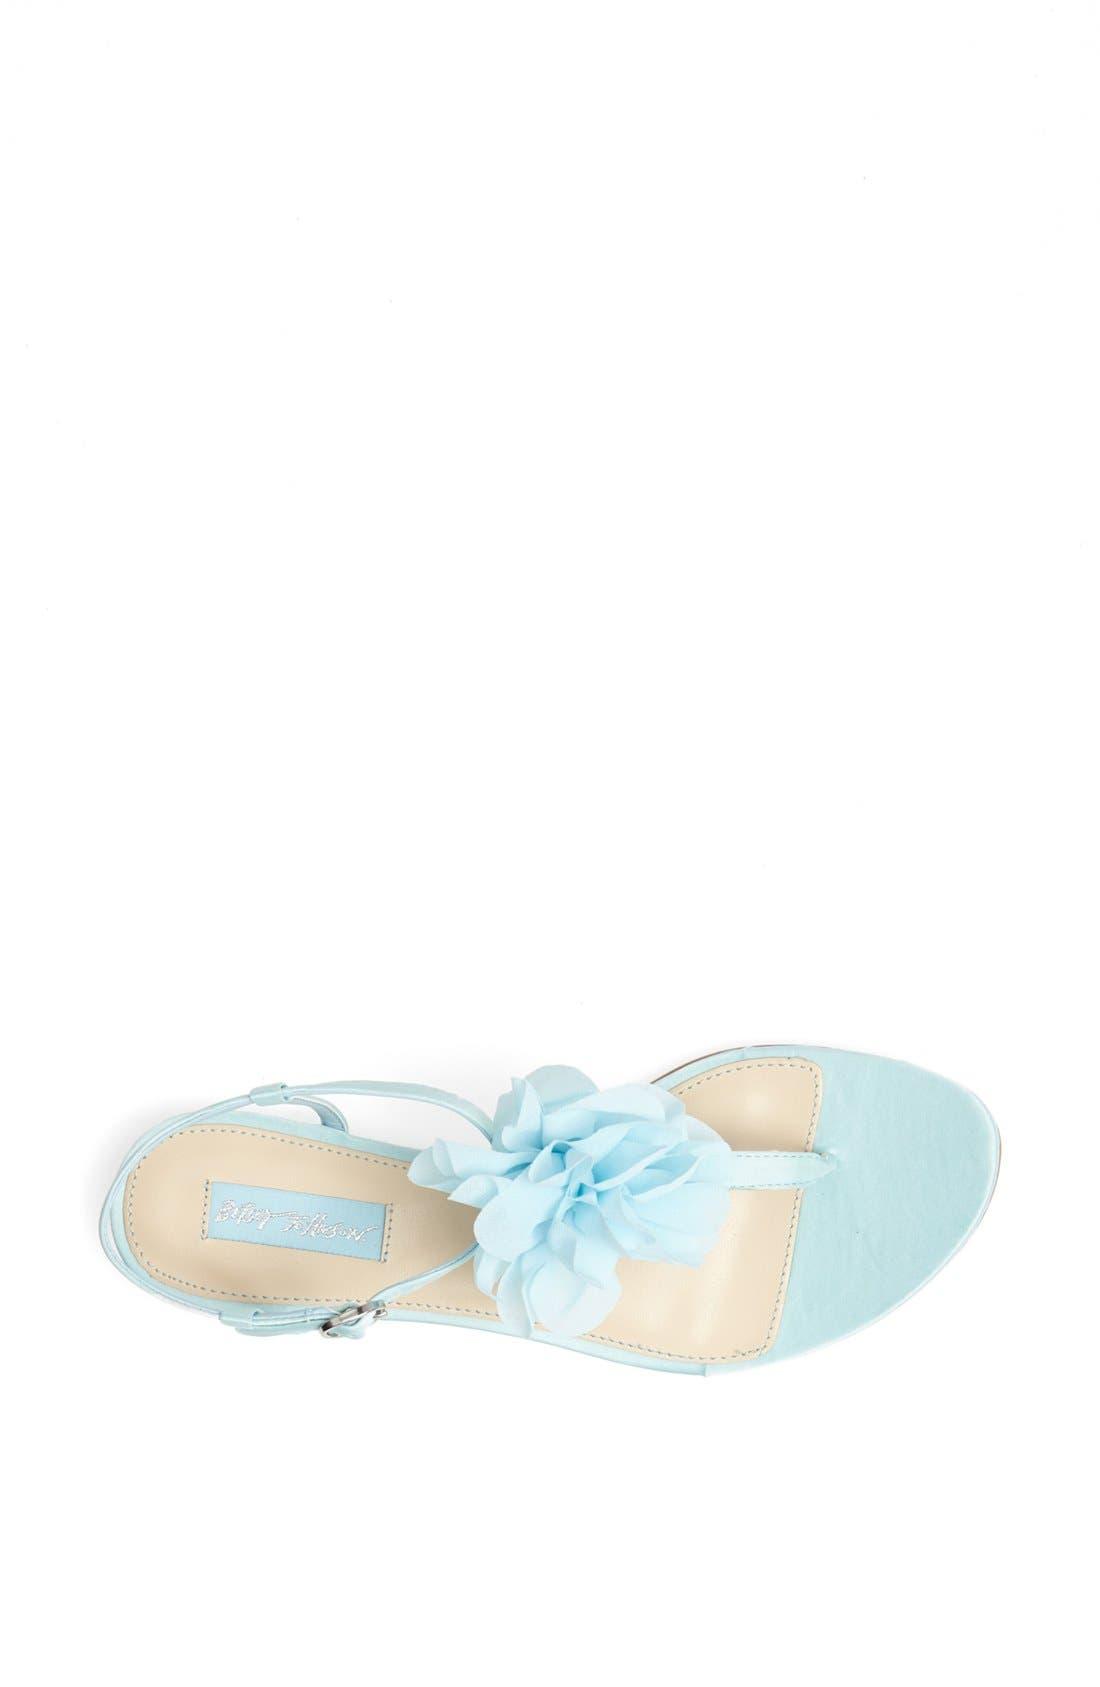 Alternate Image 3  - Blue by Betsey Johnson 'Iris' Thong Sandal